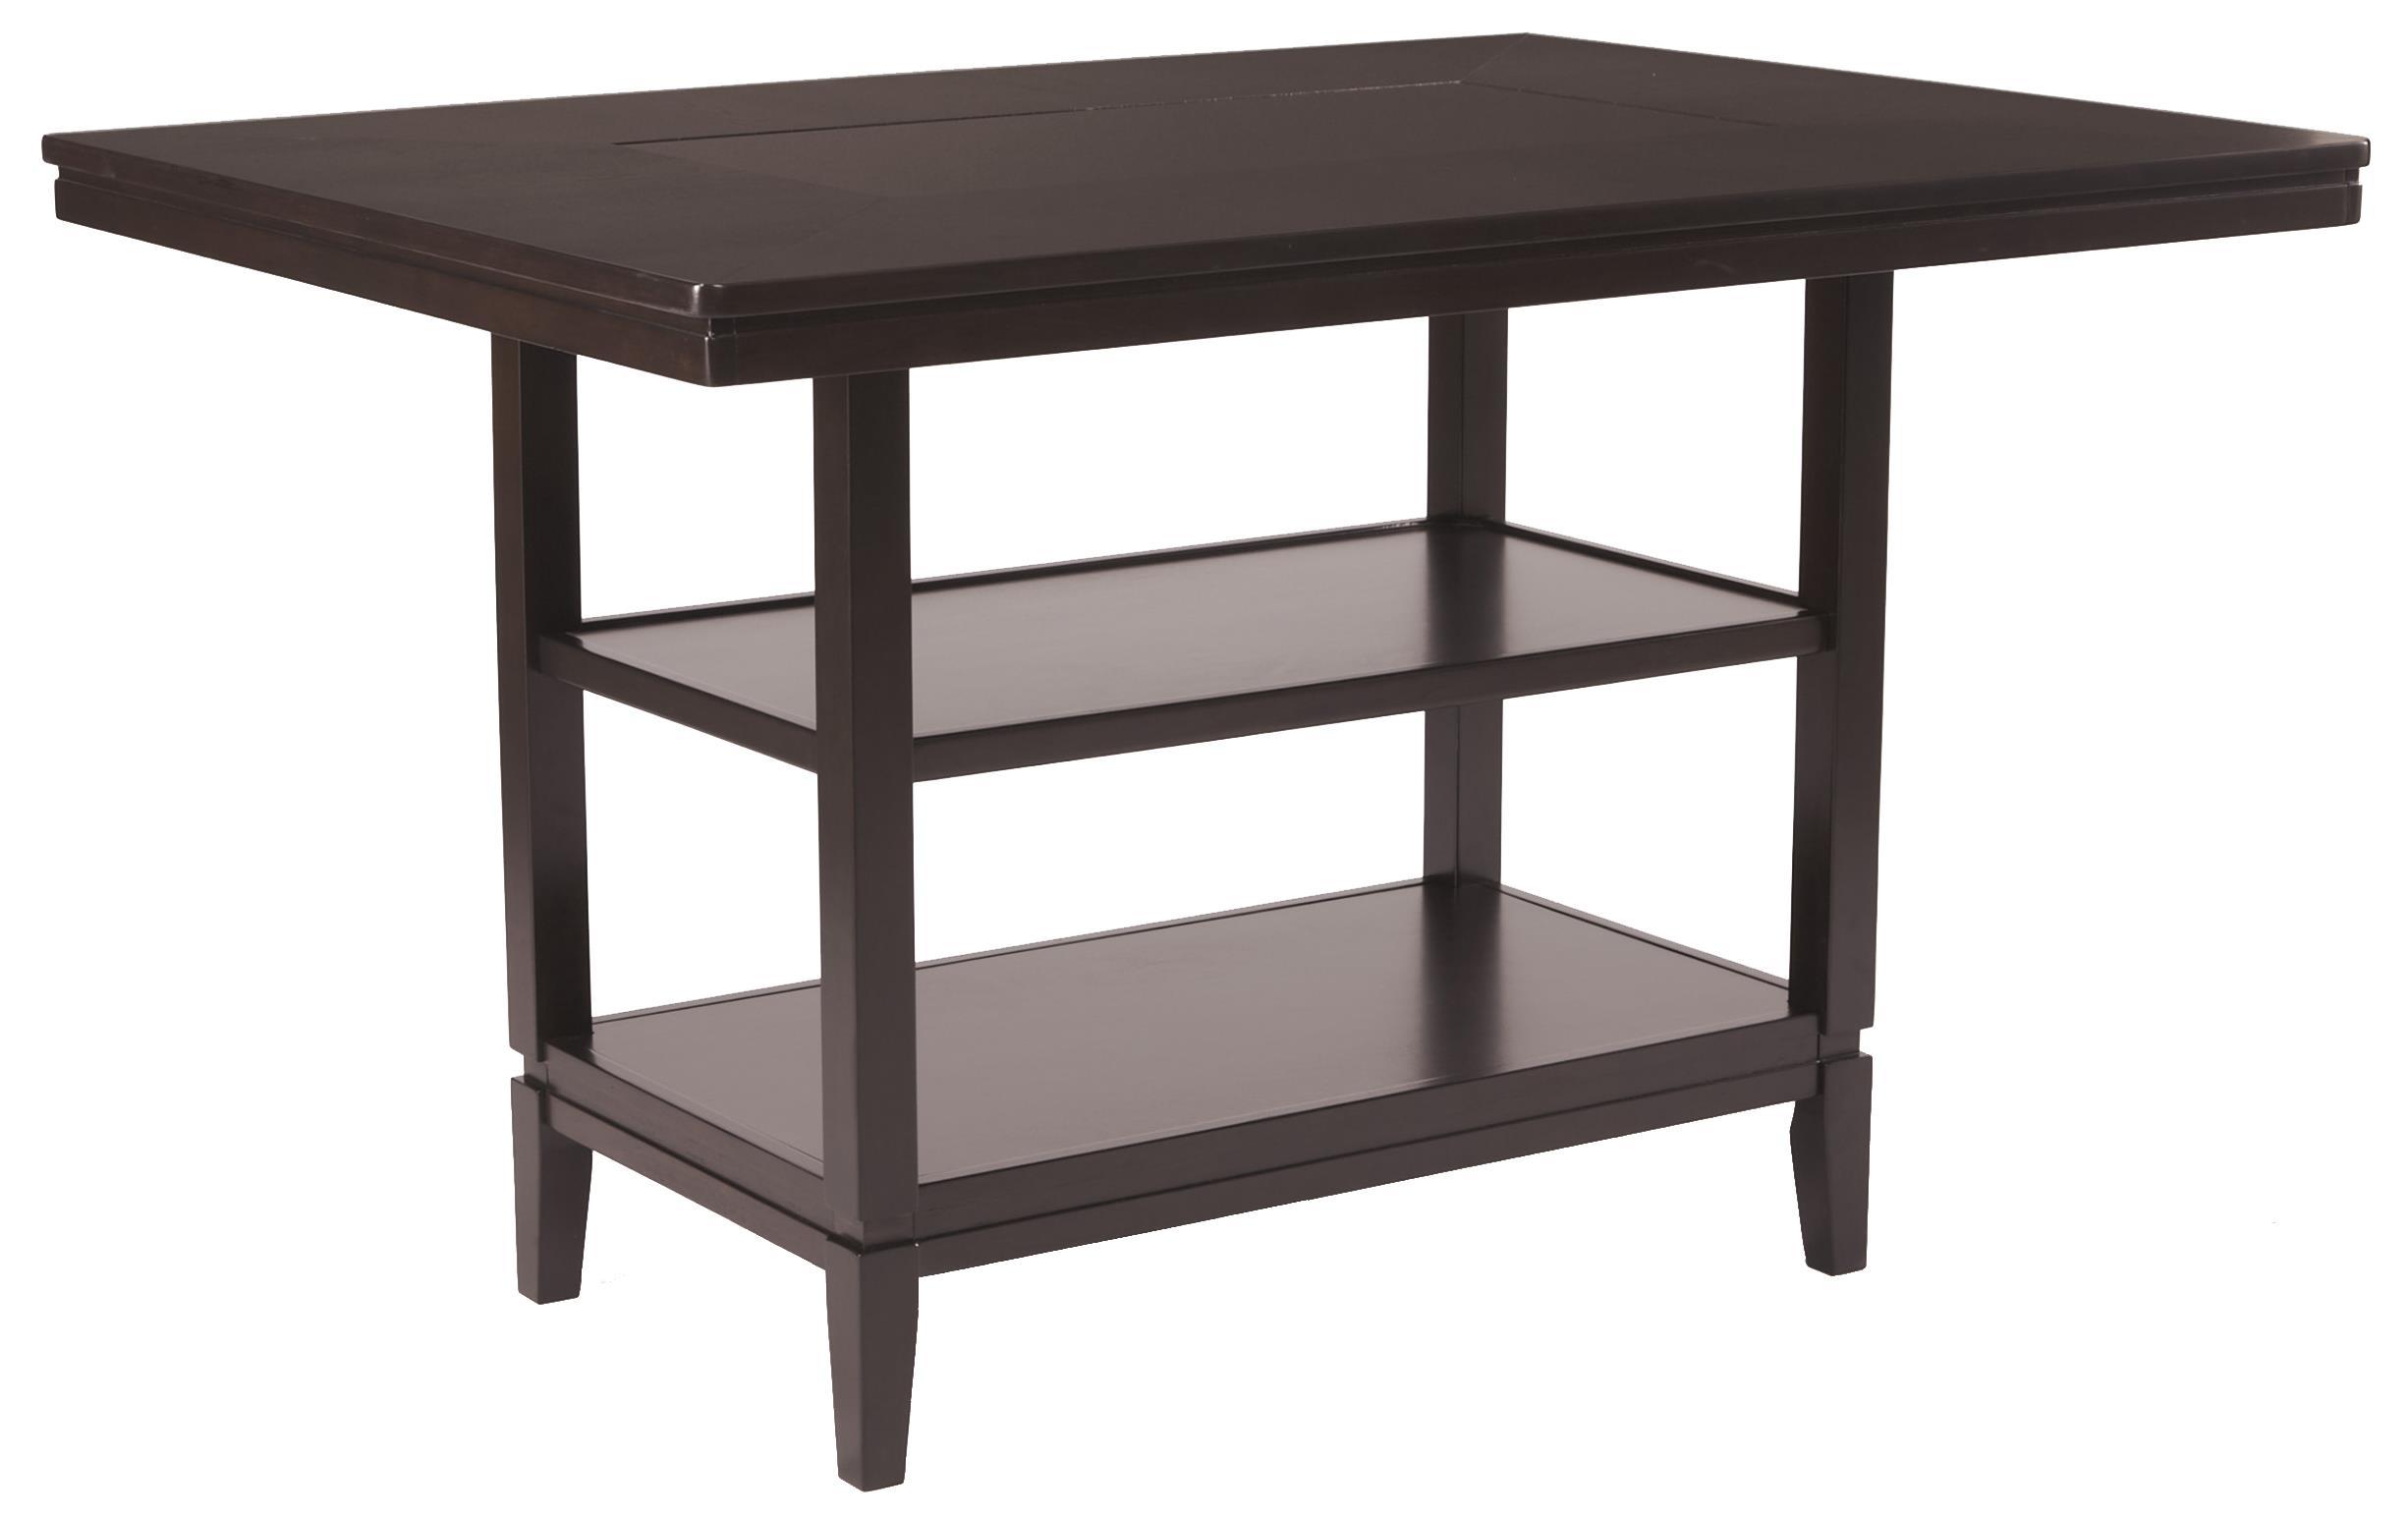 Ashley Furniture Trishelle Rectangular Dining Room Counter Table - Item Number: D550-32